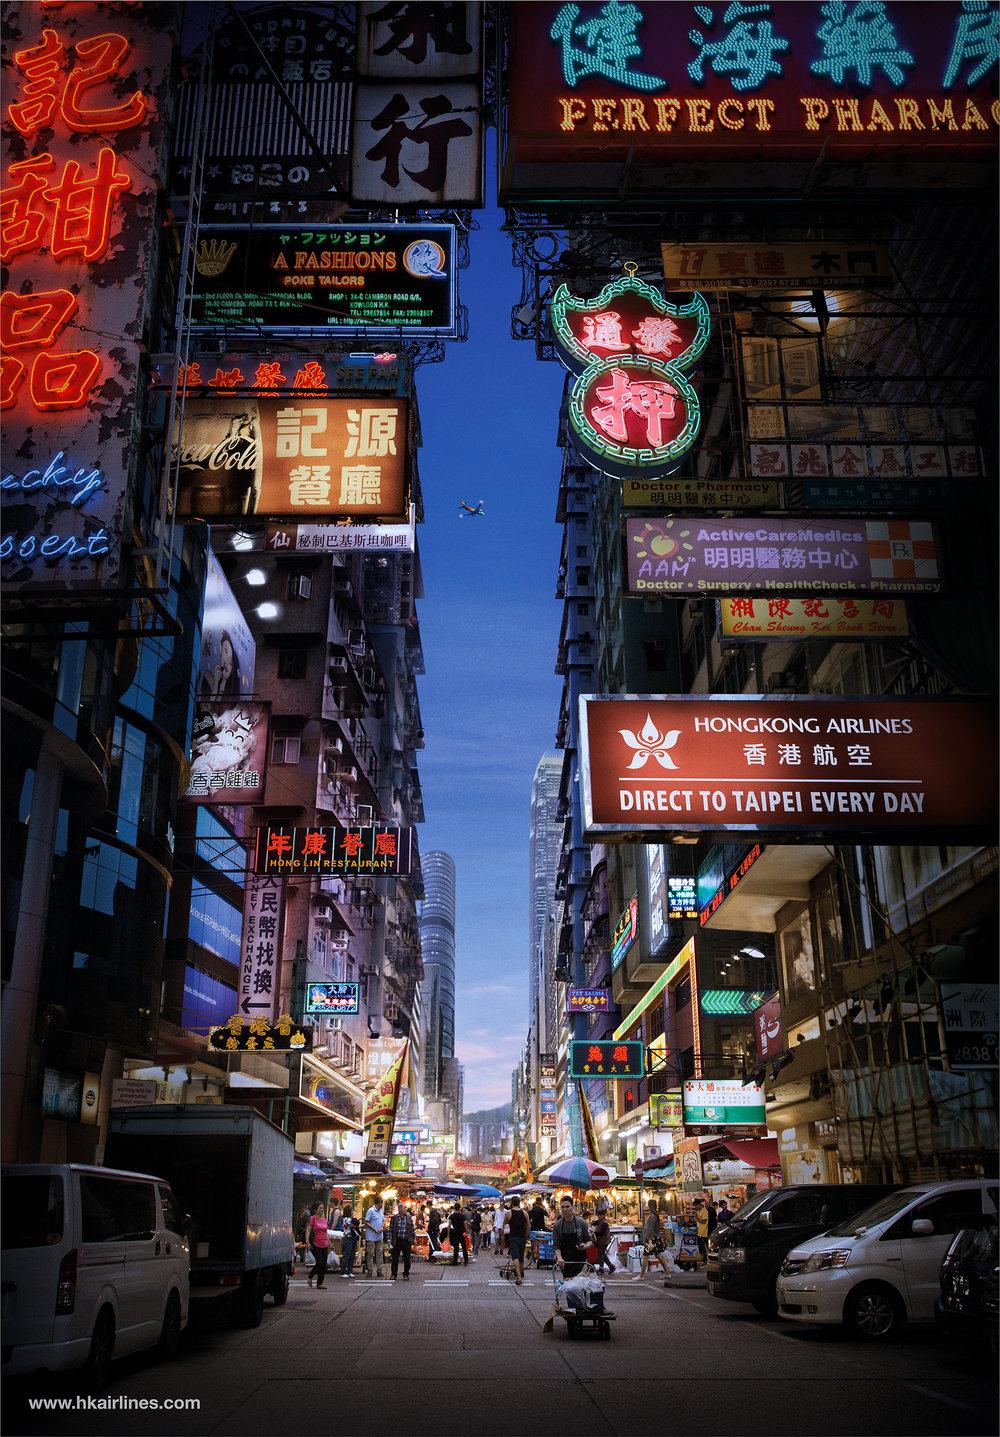 Hong Kong Airlines - Taipei.jpg